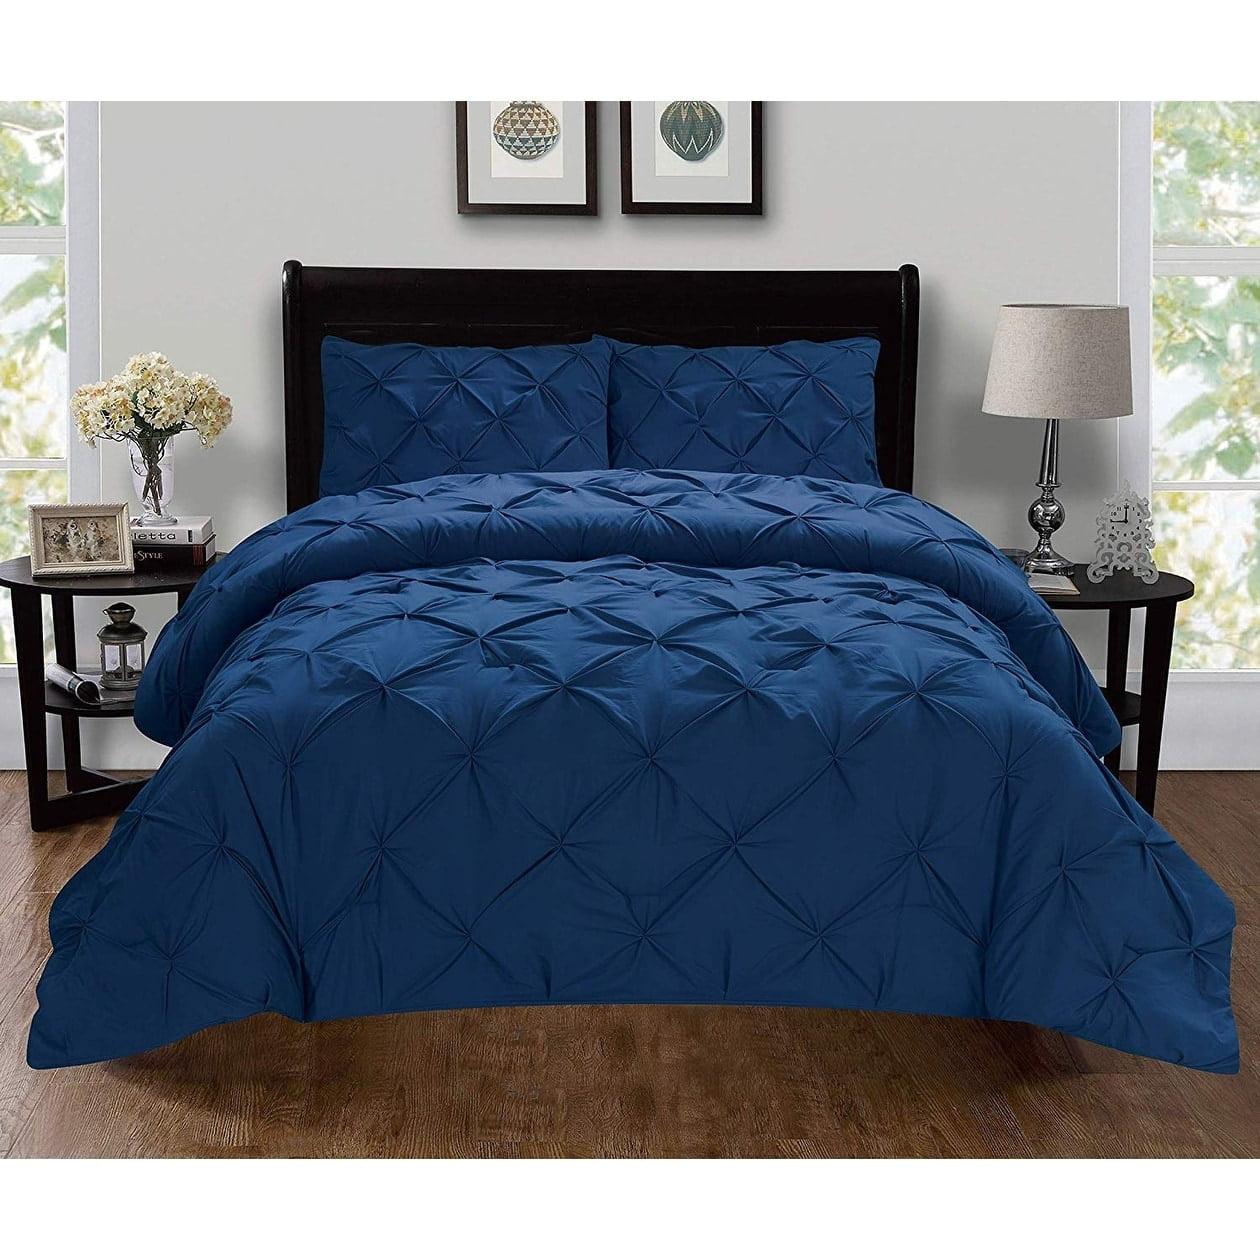 Elegant Comfort  Luxury Super-Soft 3-Piece Pintuck Design Duvet Cover Set, (Insert Comforter Protector) Wrinkle-Free